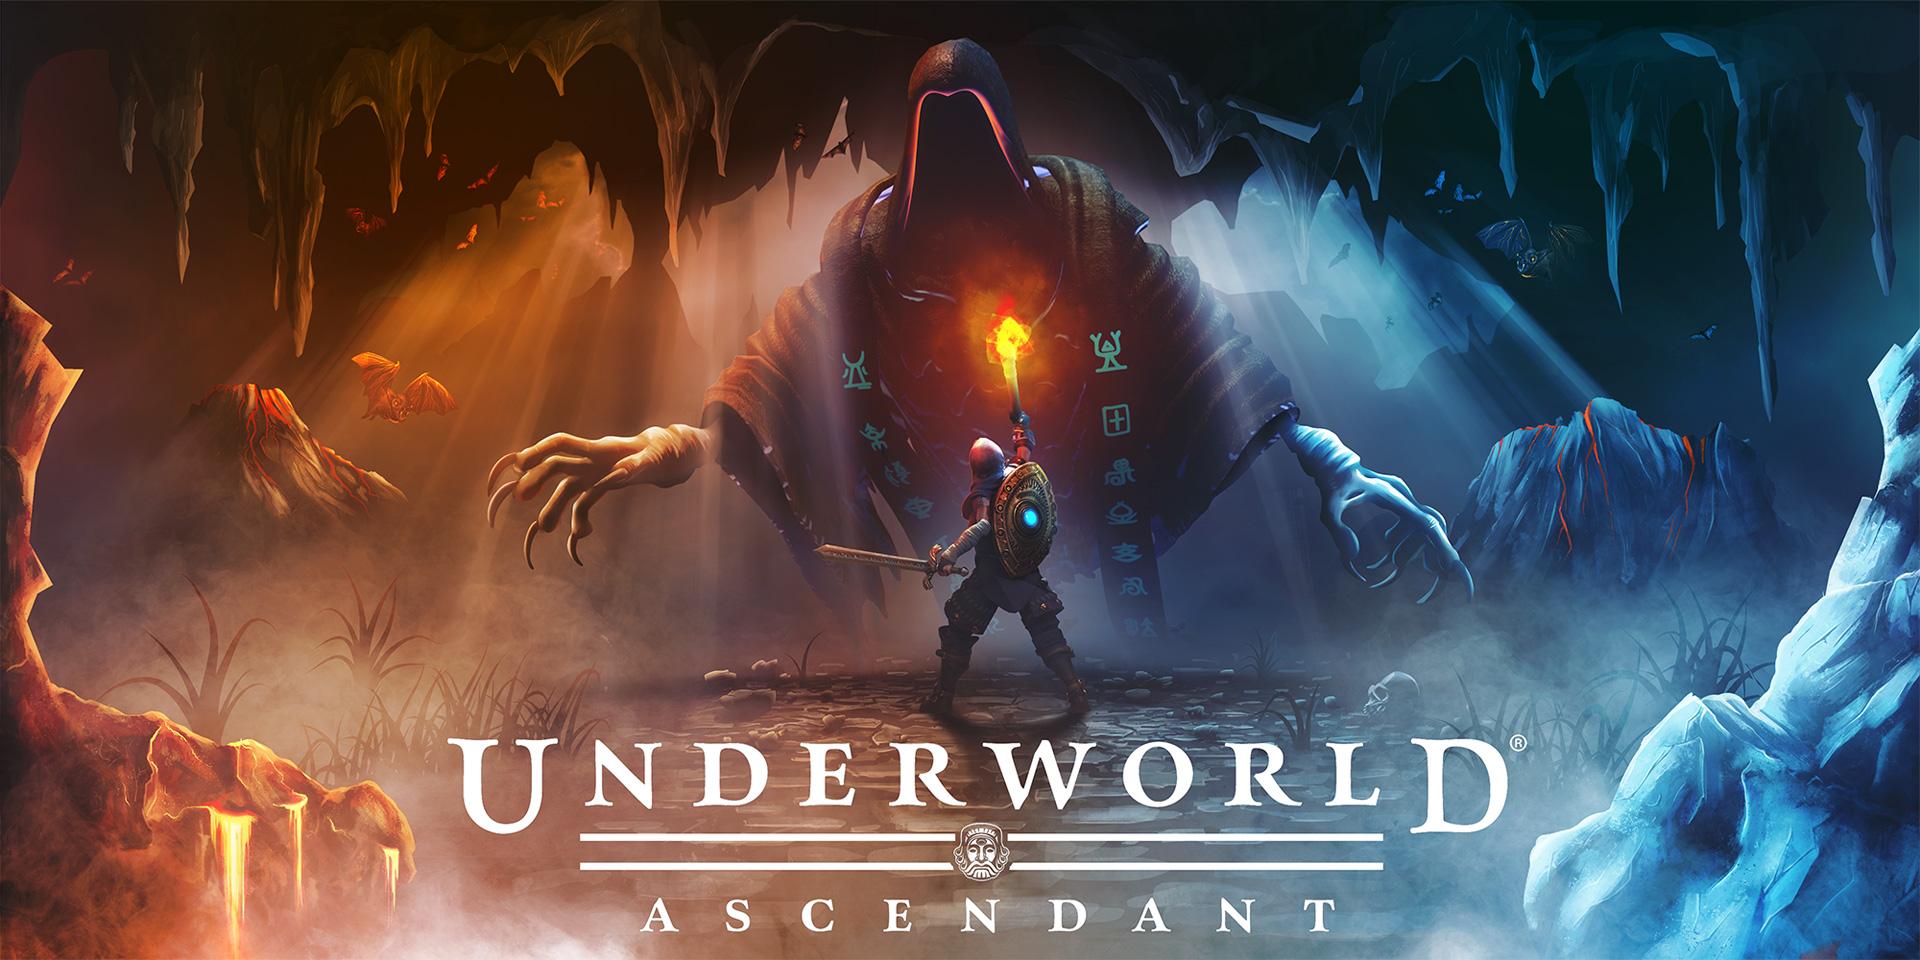 http://www.idgtv.es/archivos/201806/underworld-ascendant-art.jpg